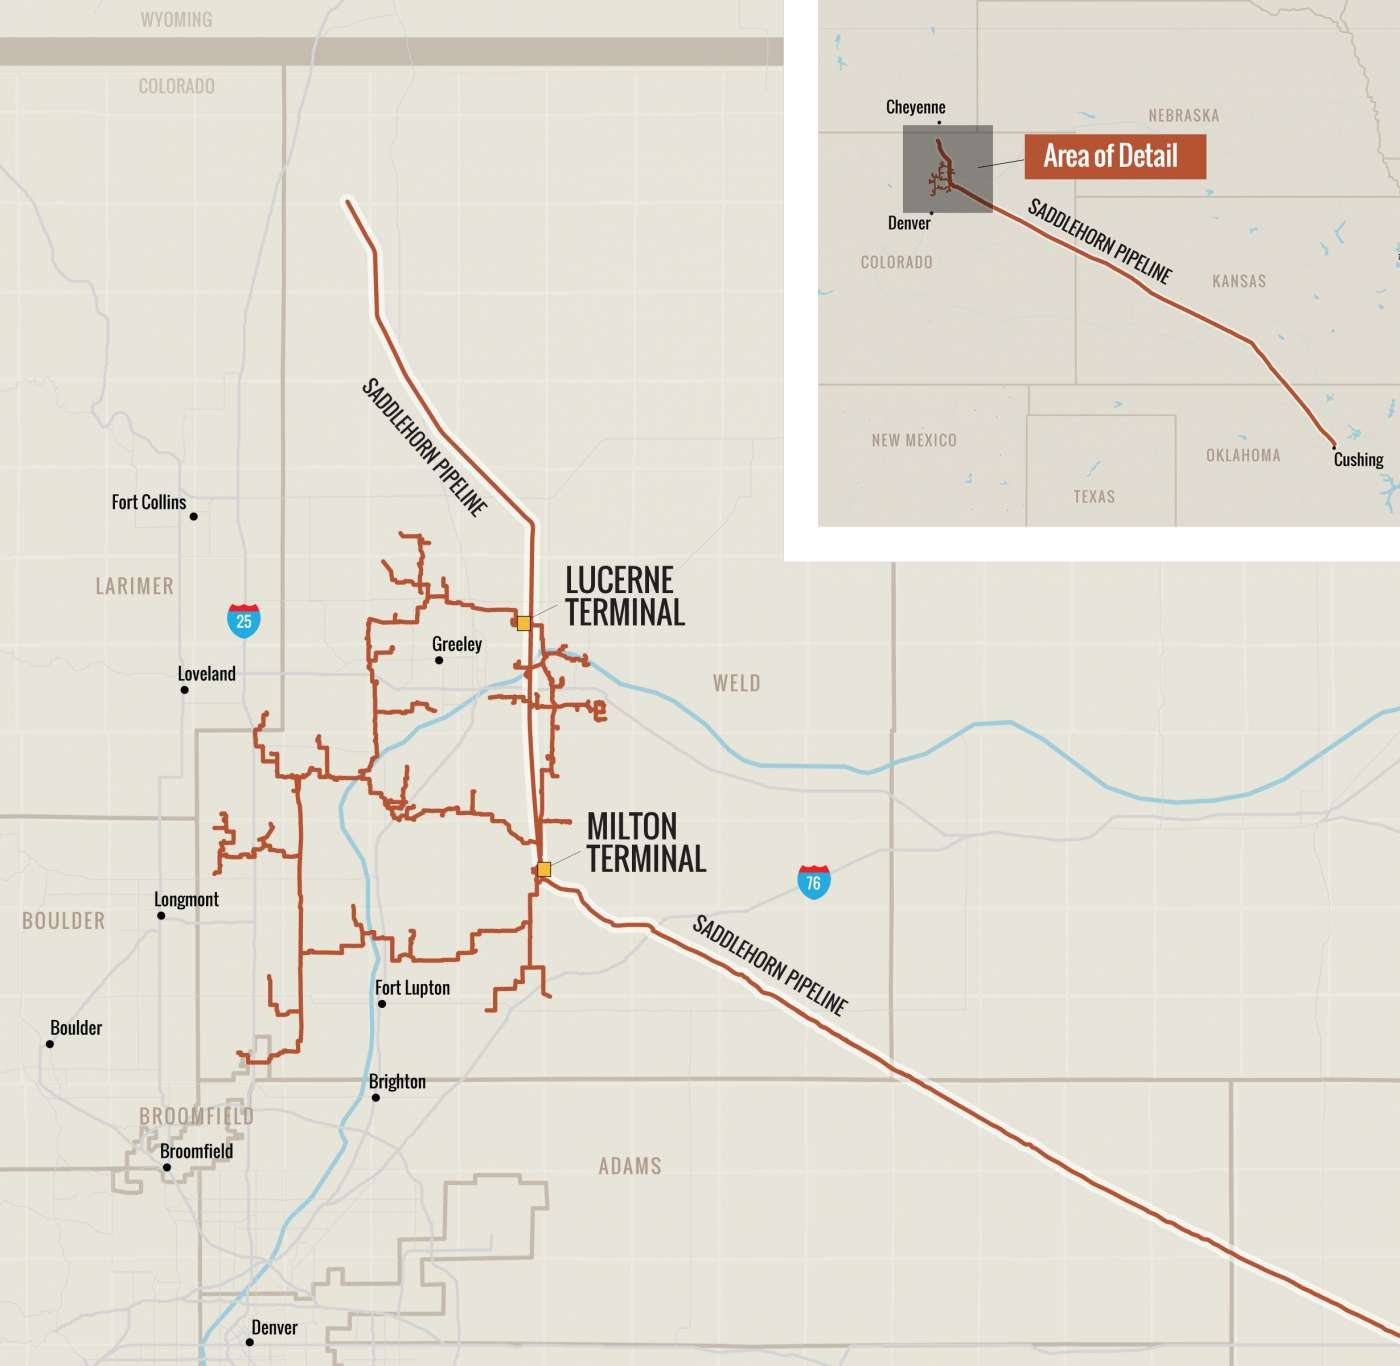 Black Diamond Gathering System and Saddlehorn Pipeline